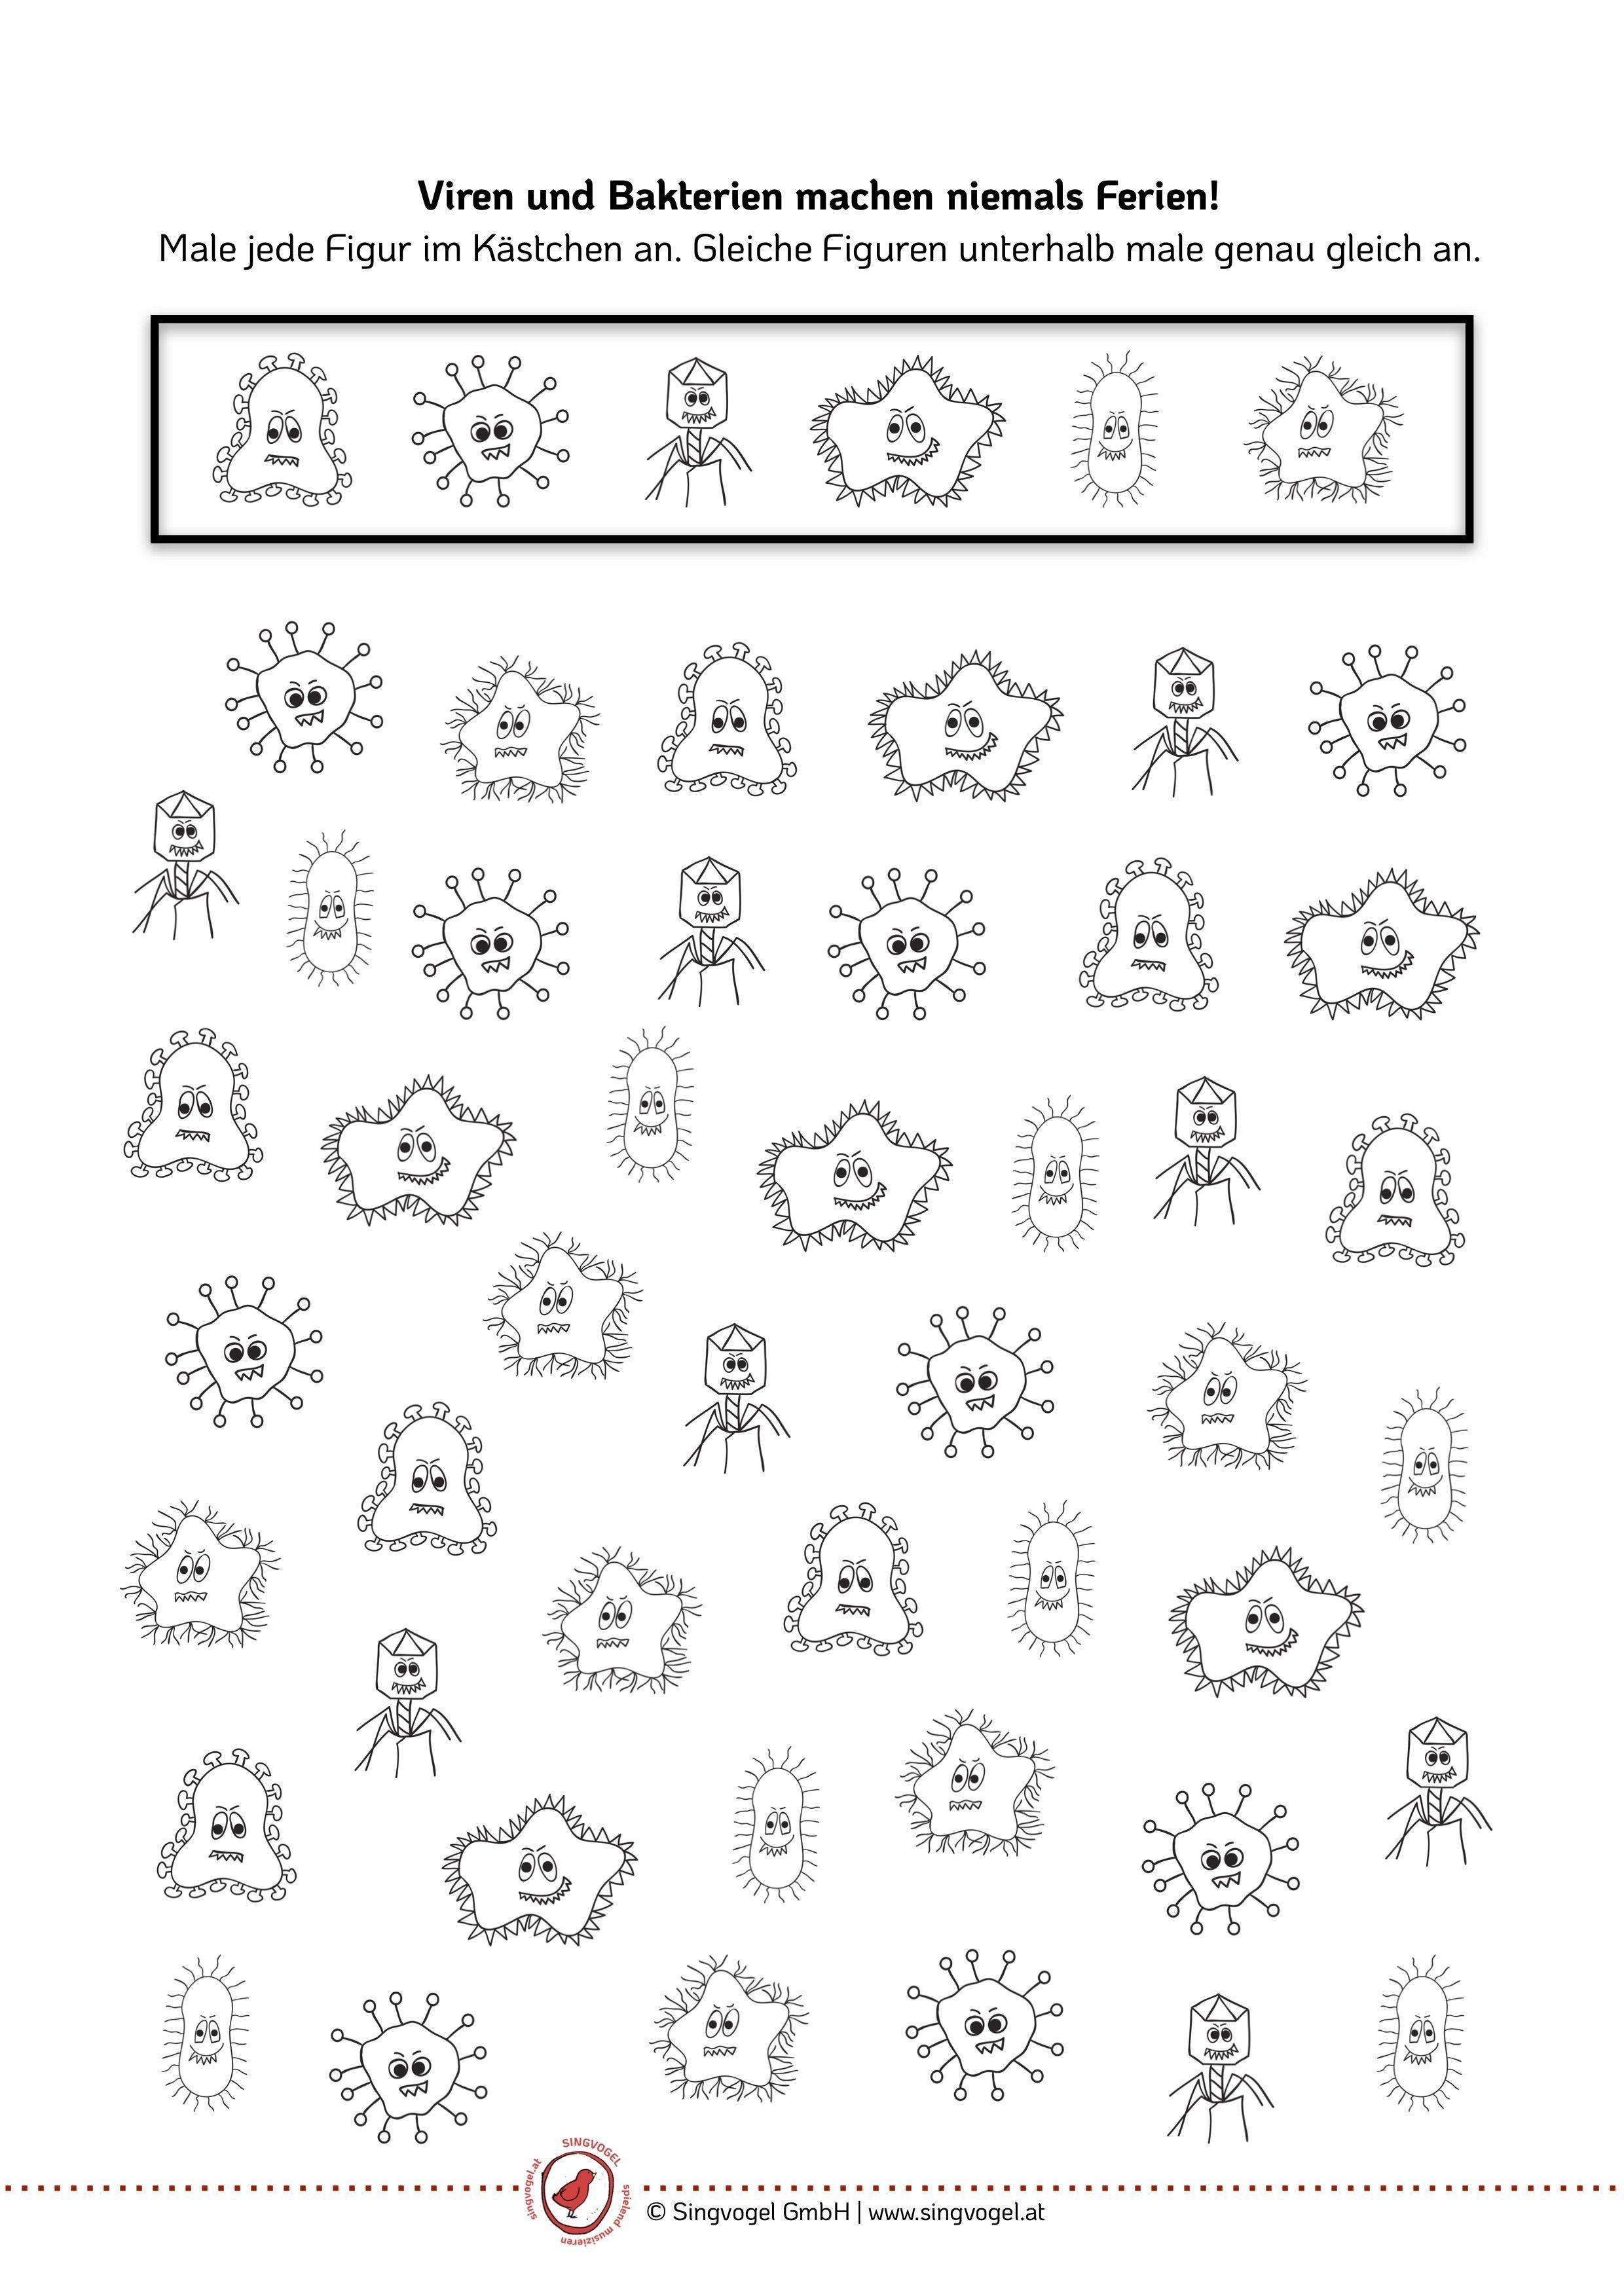 Viren Und Bakterien Kunstunterricht Kunstunterricht Ferien